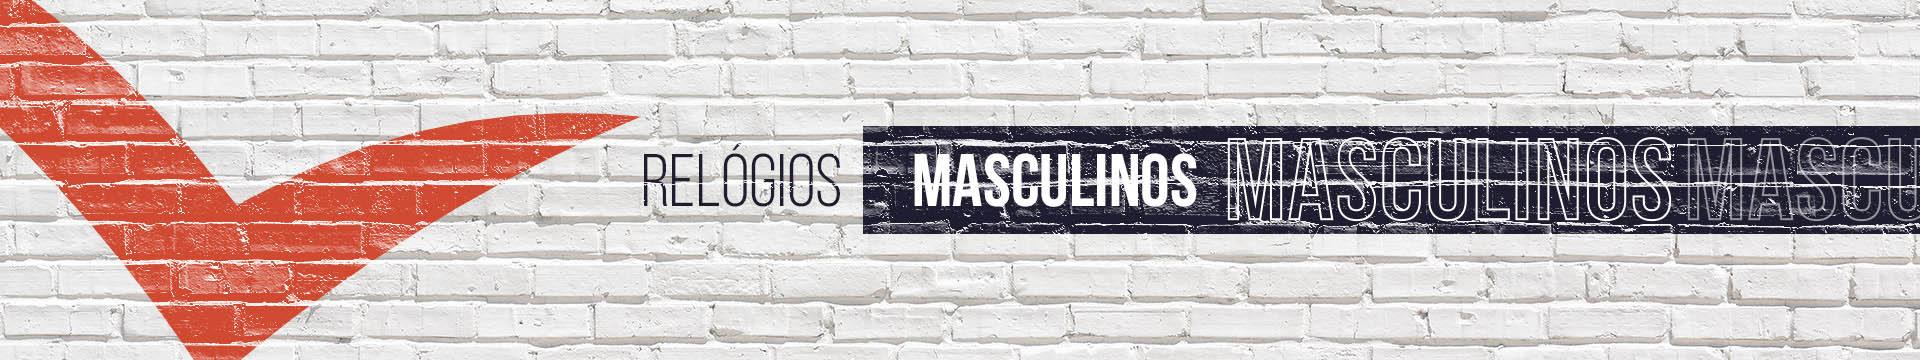 BannerMasculino